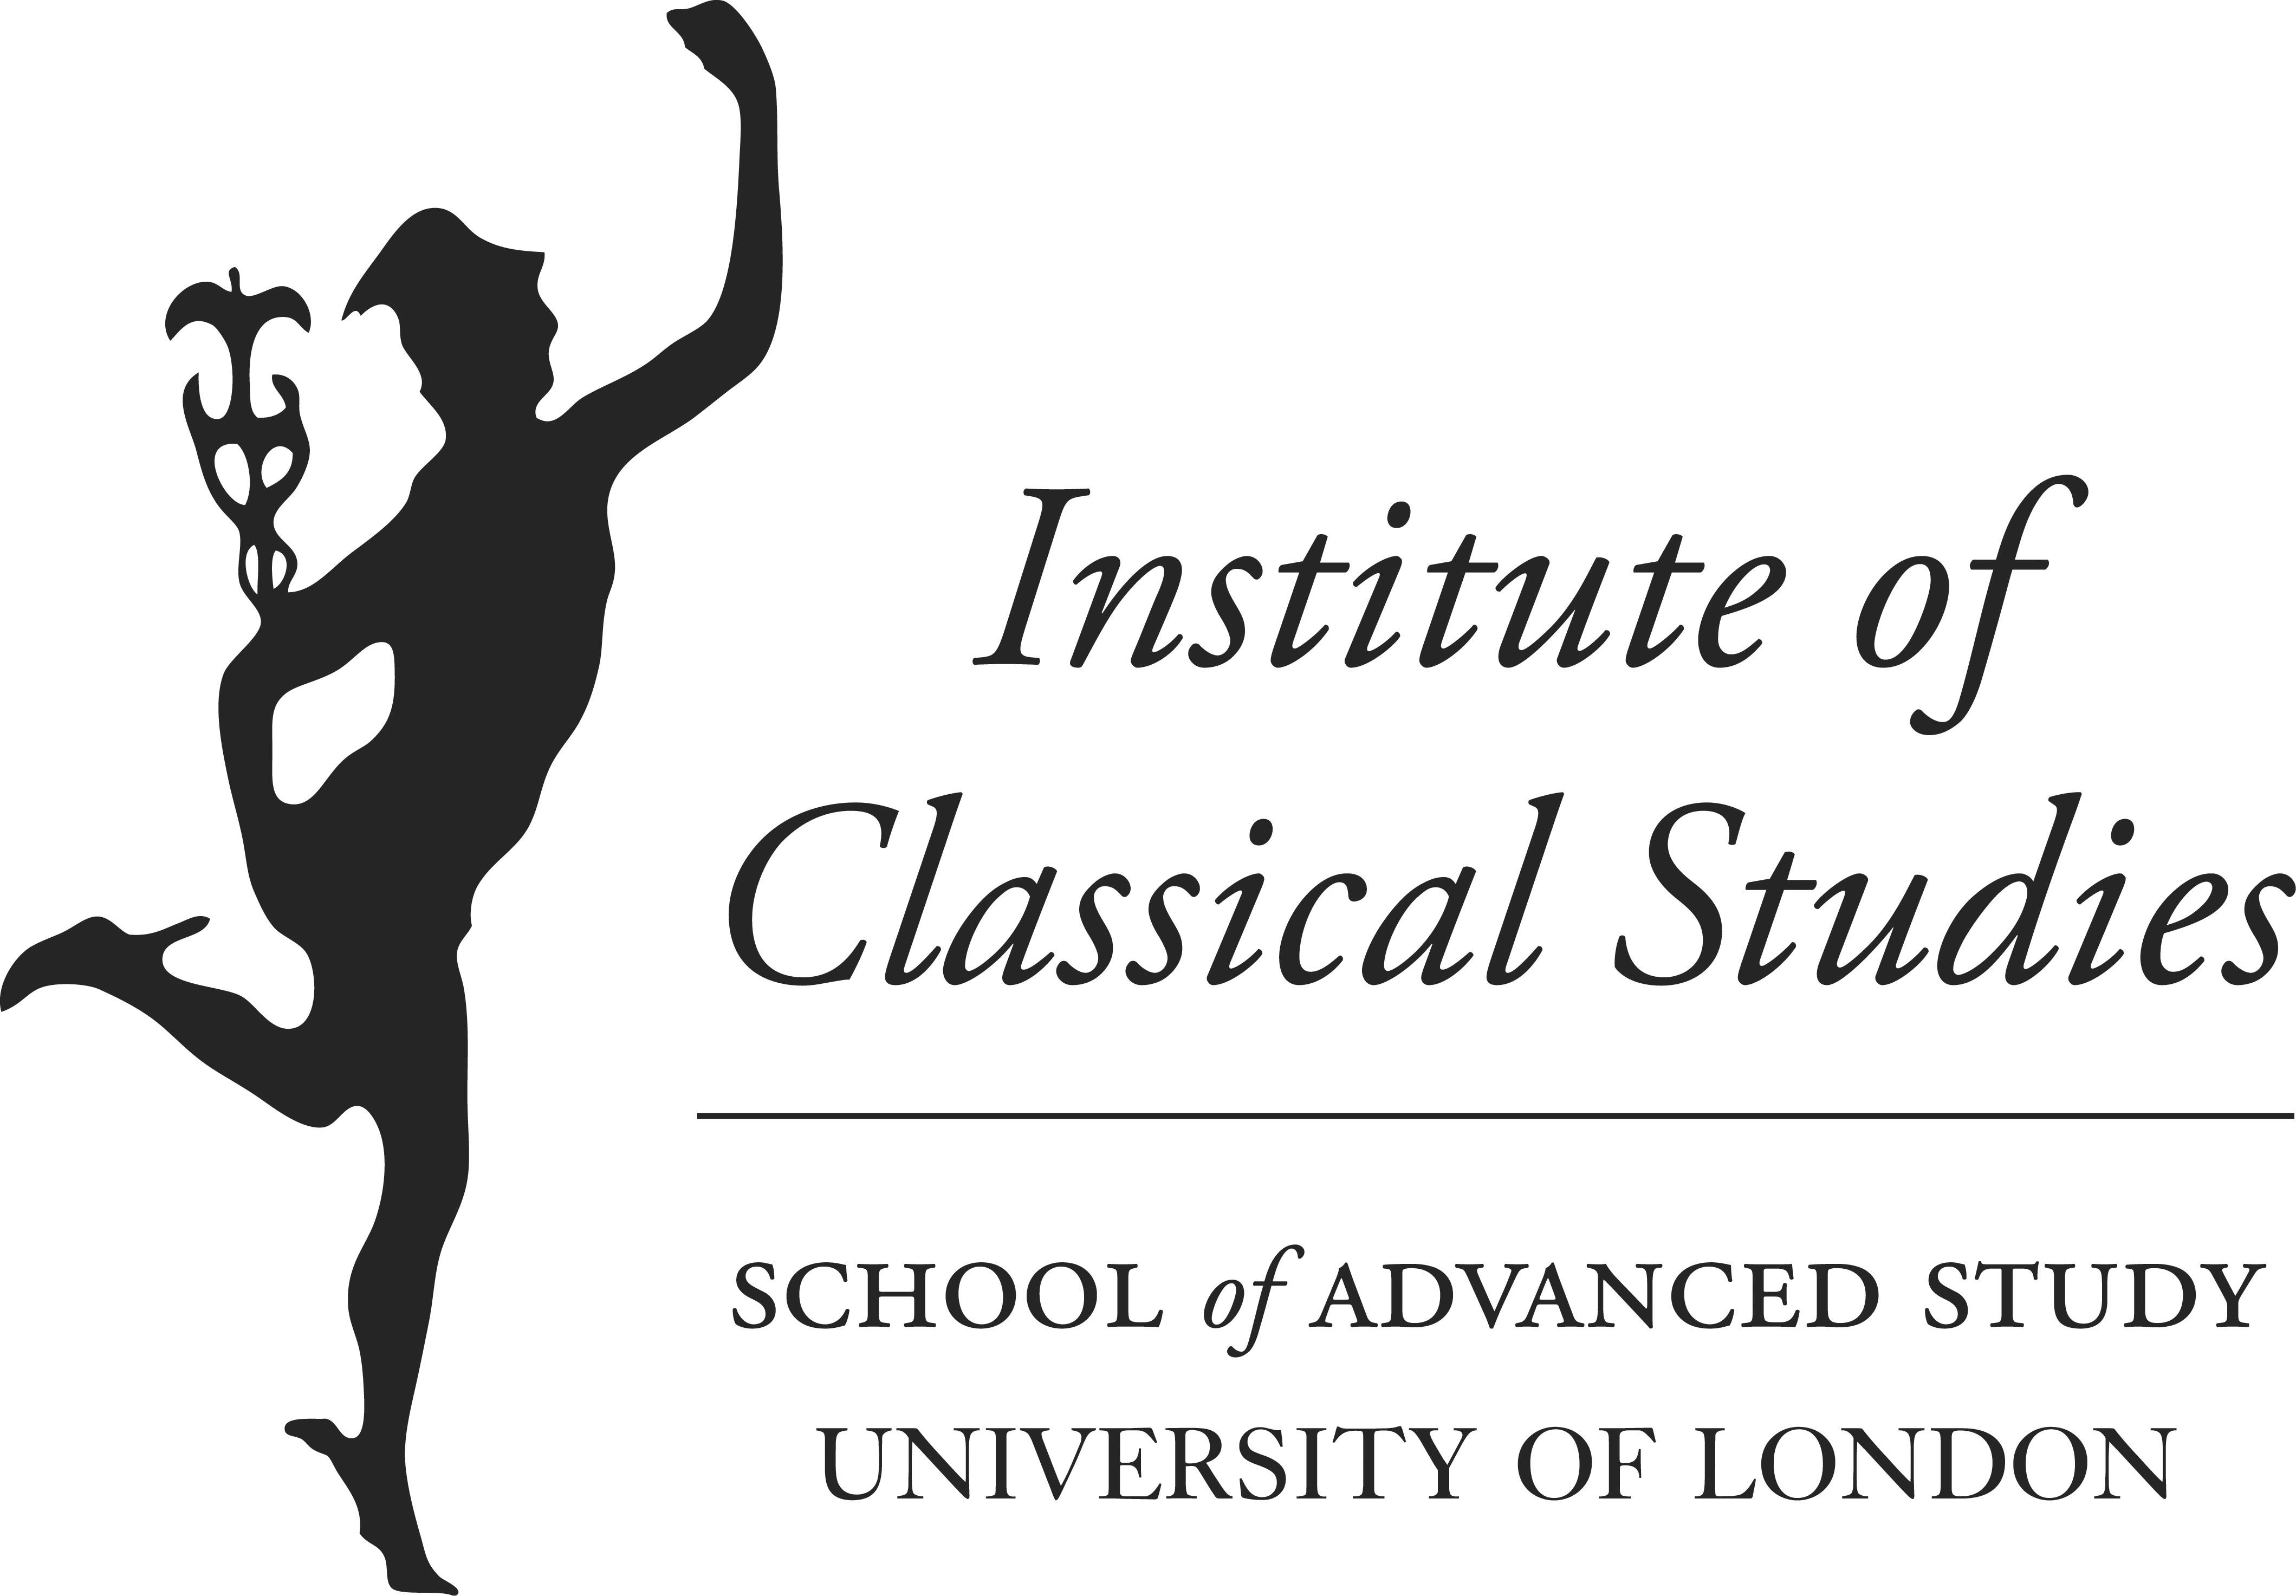 Institute of Classical Studies, School of Advanced Study, University of London